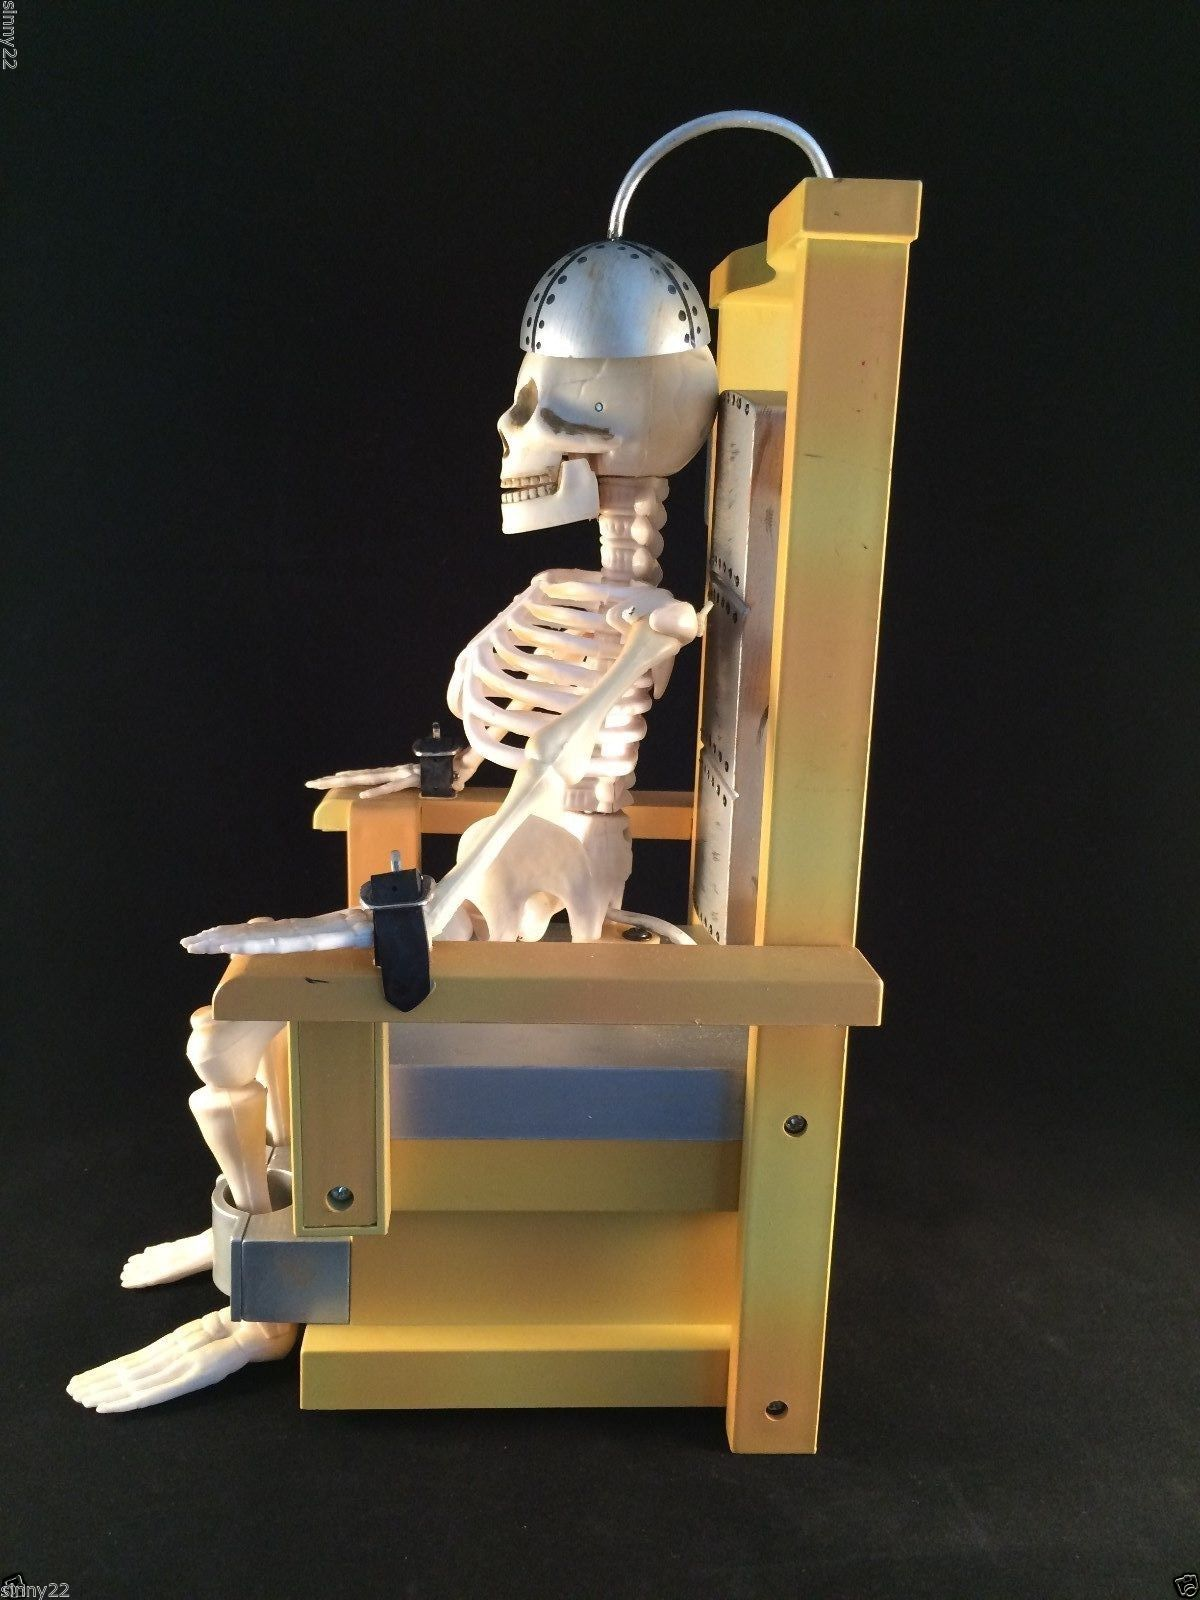 Image rare shock me sherlock joltin jack animated gemmy electric chair skeleton gemmy - Cb industry chair ...